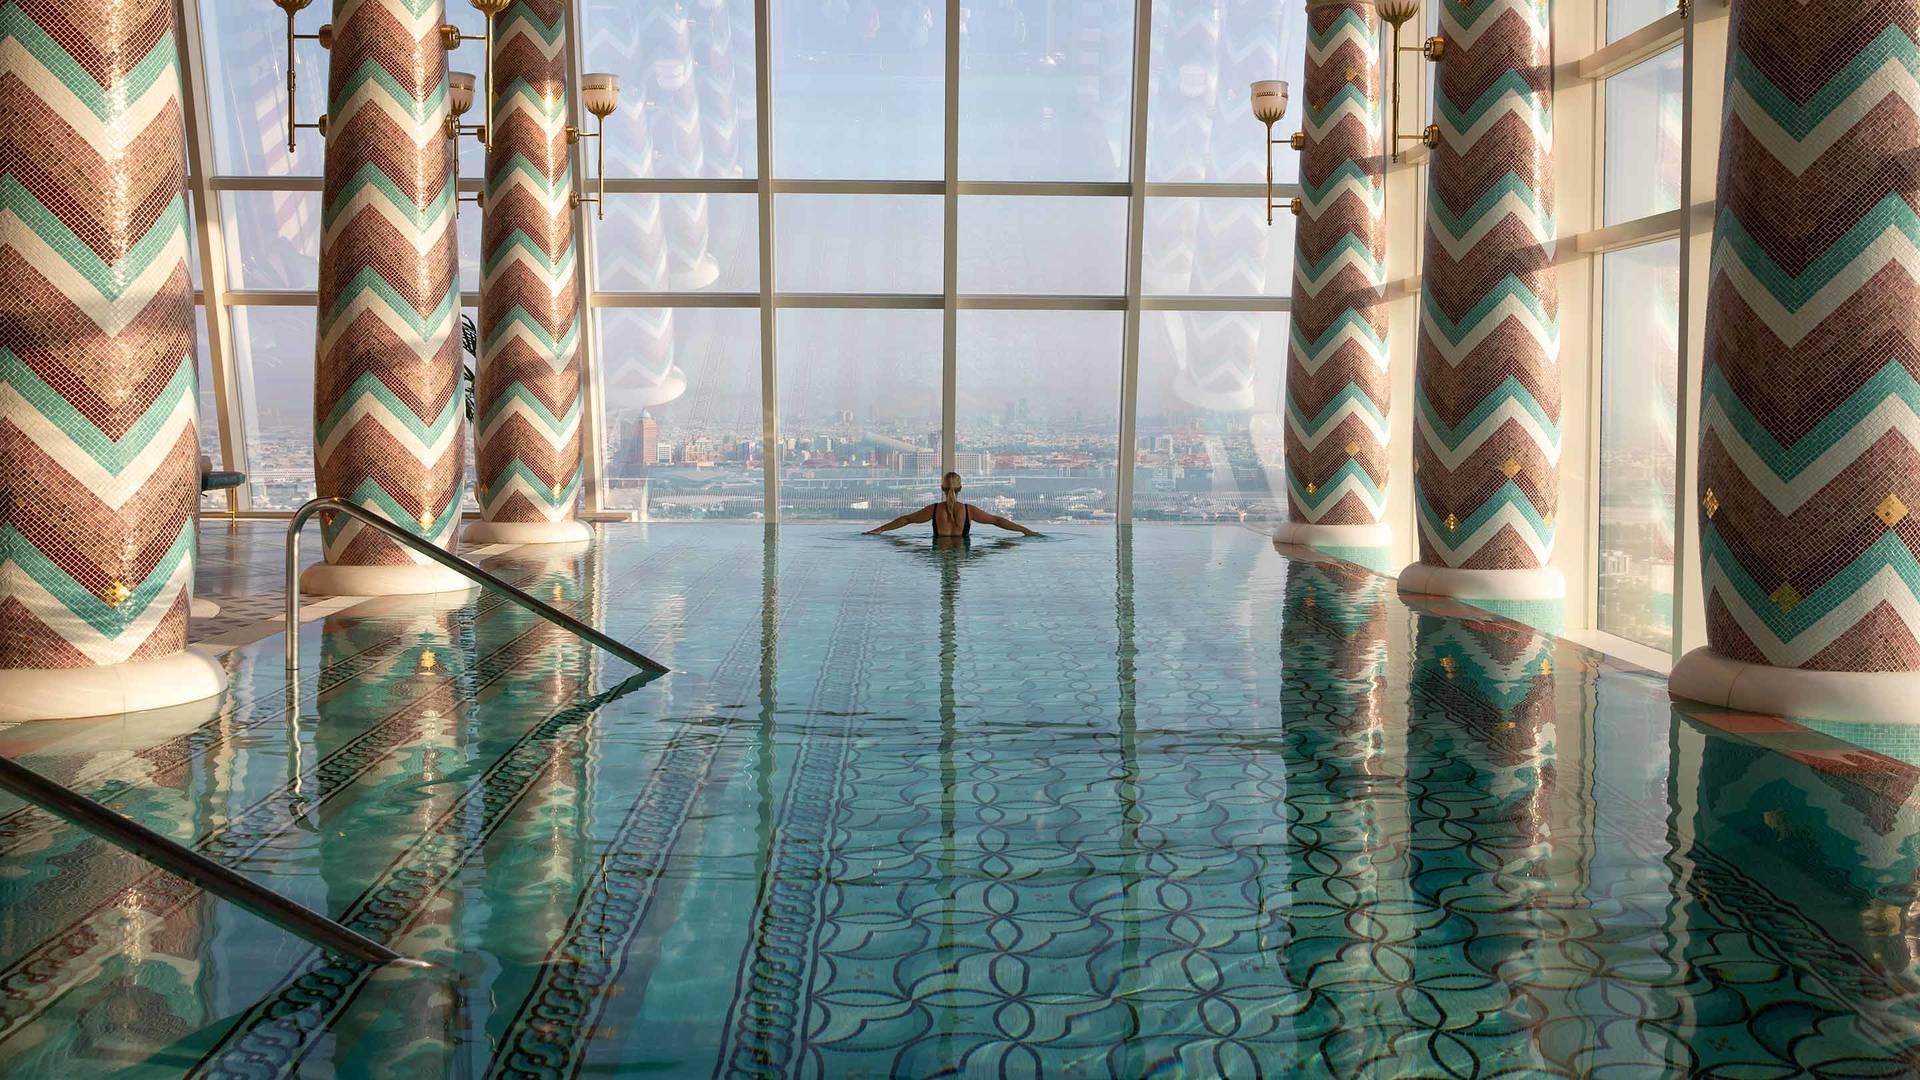 Jumeirah Bruj Al Arab Talise Spa pool3_6-4